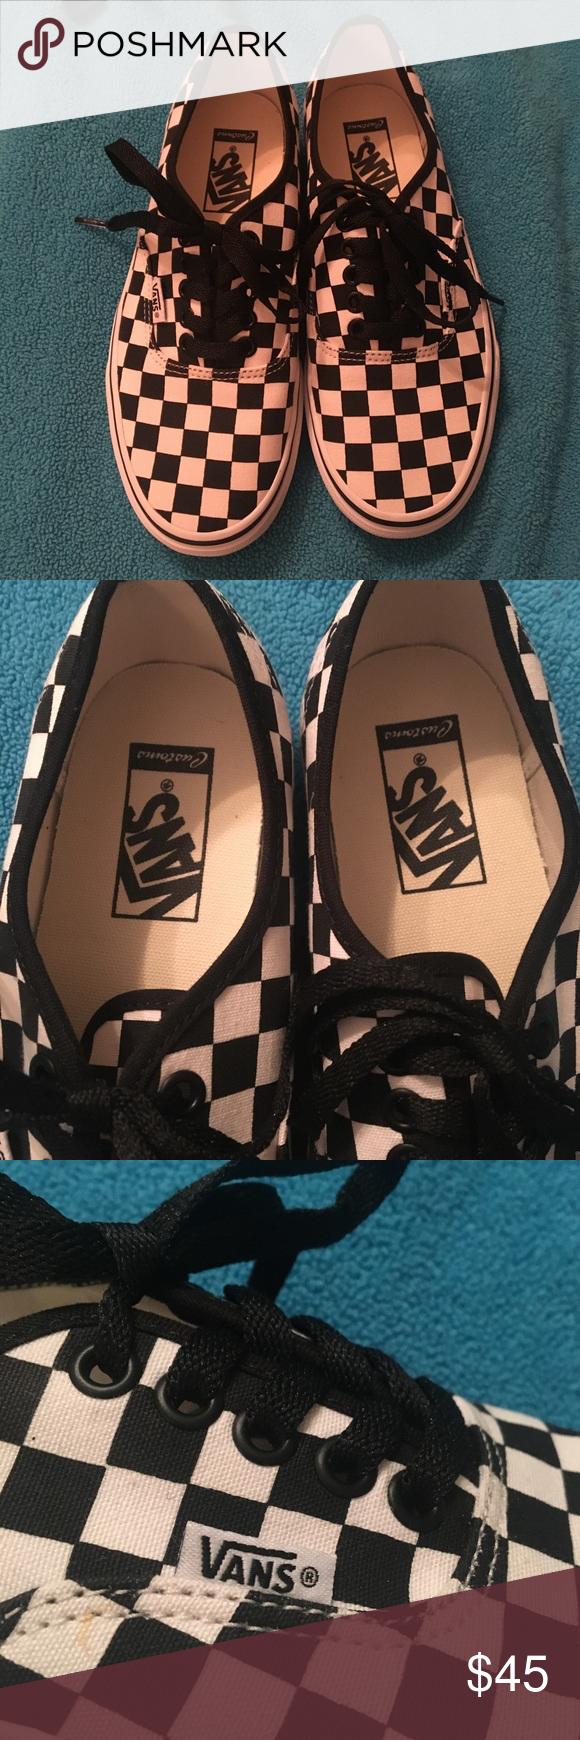 vans checkerboard authentic custom